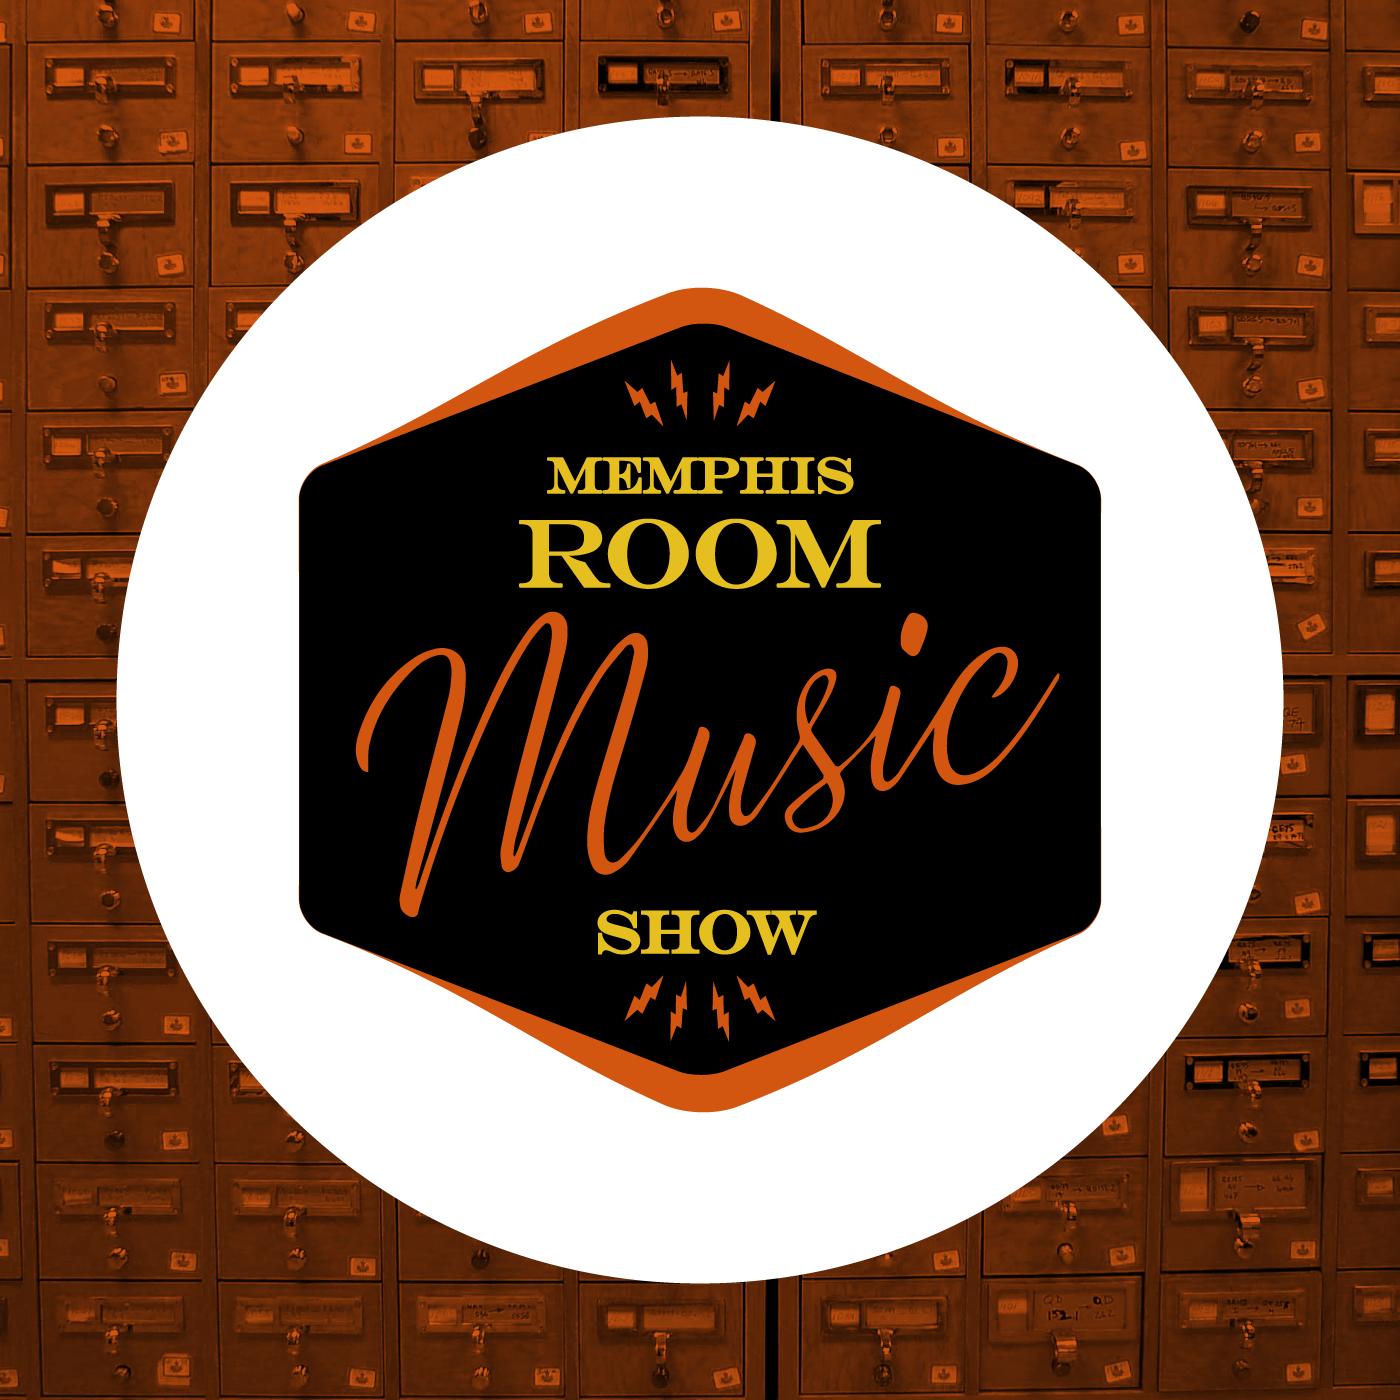 Memphis Room Music Show The OAM Network